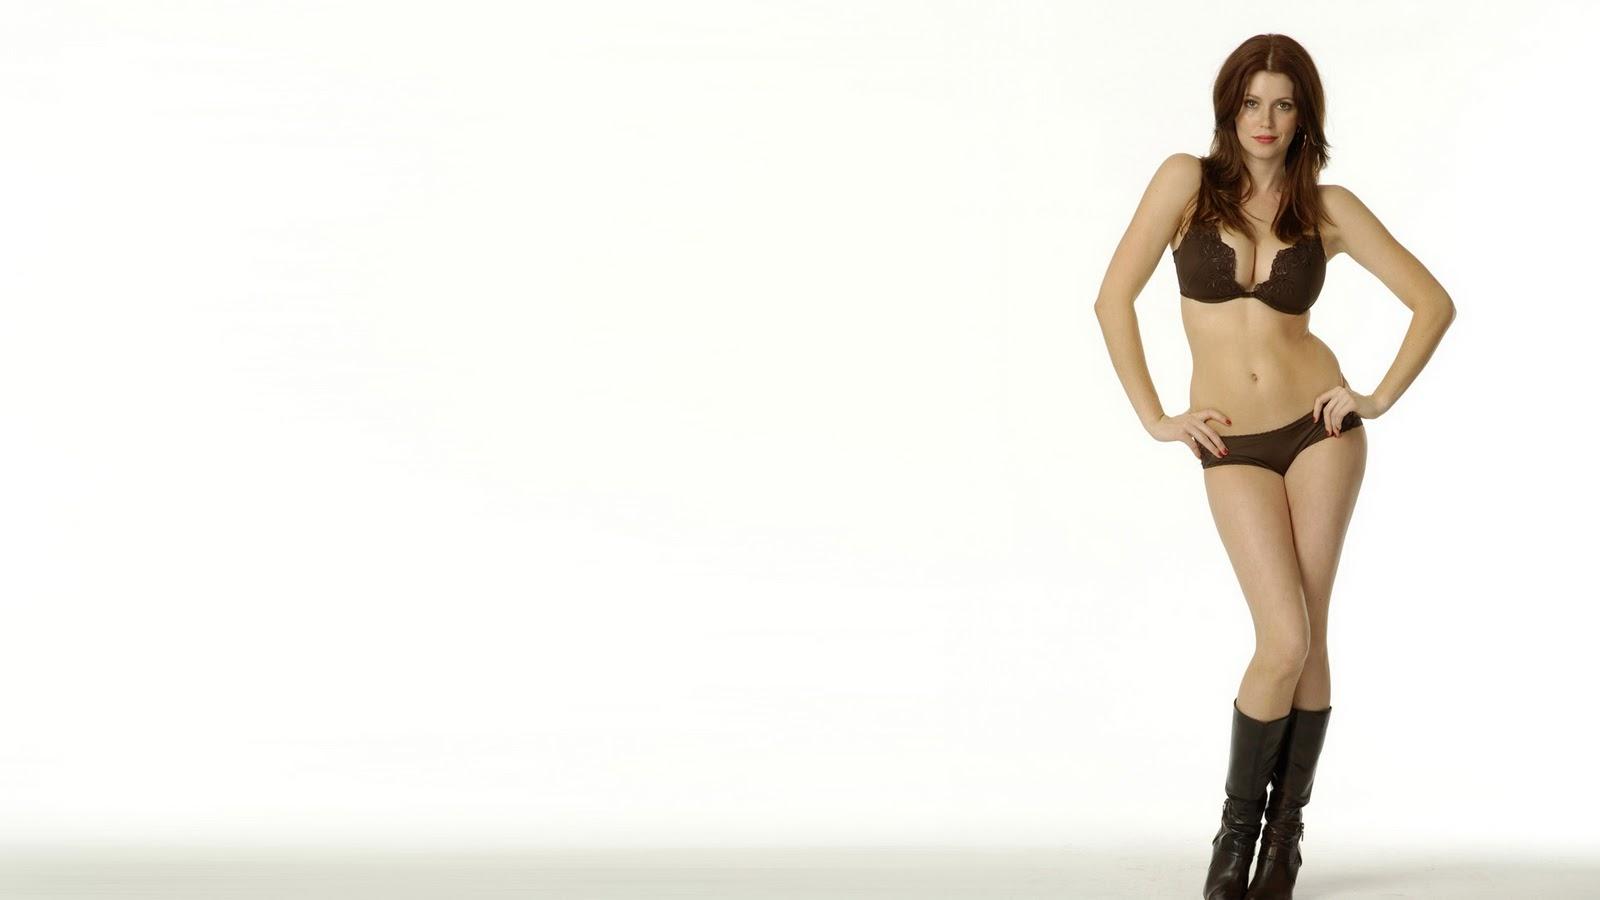 http://1.bp.blogspot.com/-Fo3zMjPQ_2s/TVs01uod8II/AAAAAAAAAR8/niqM90OZVRM/s1600/Diora-Baird-x-009-1080p.JPG